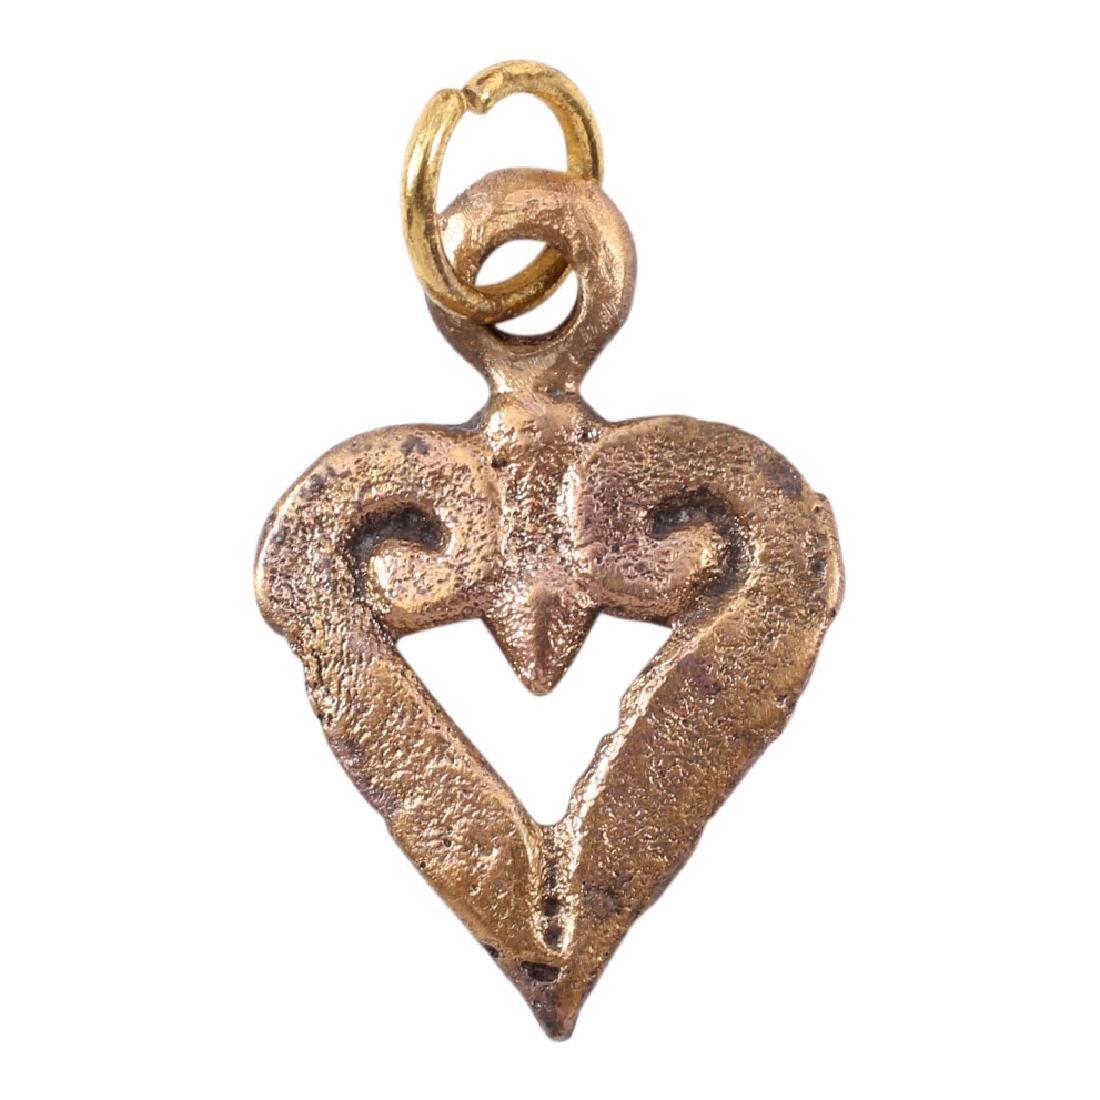 Viking Heart Pendant, 9th-10th Century